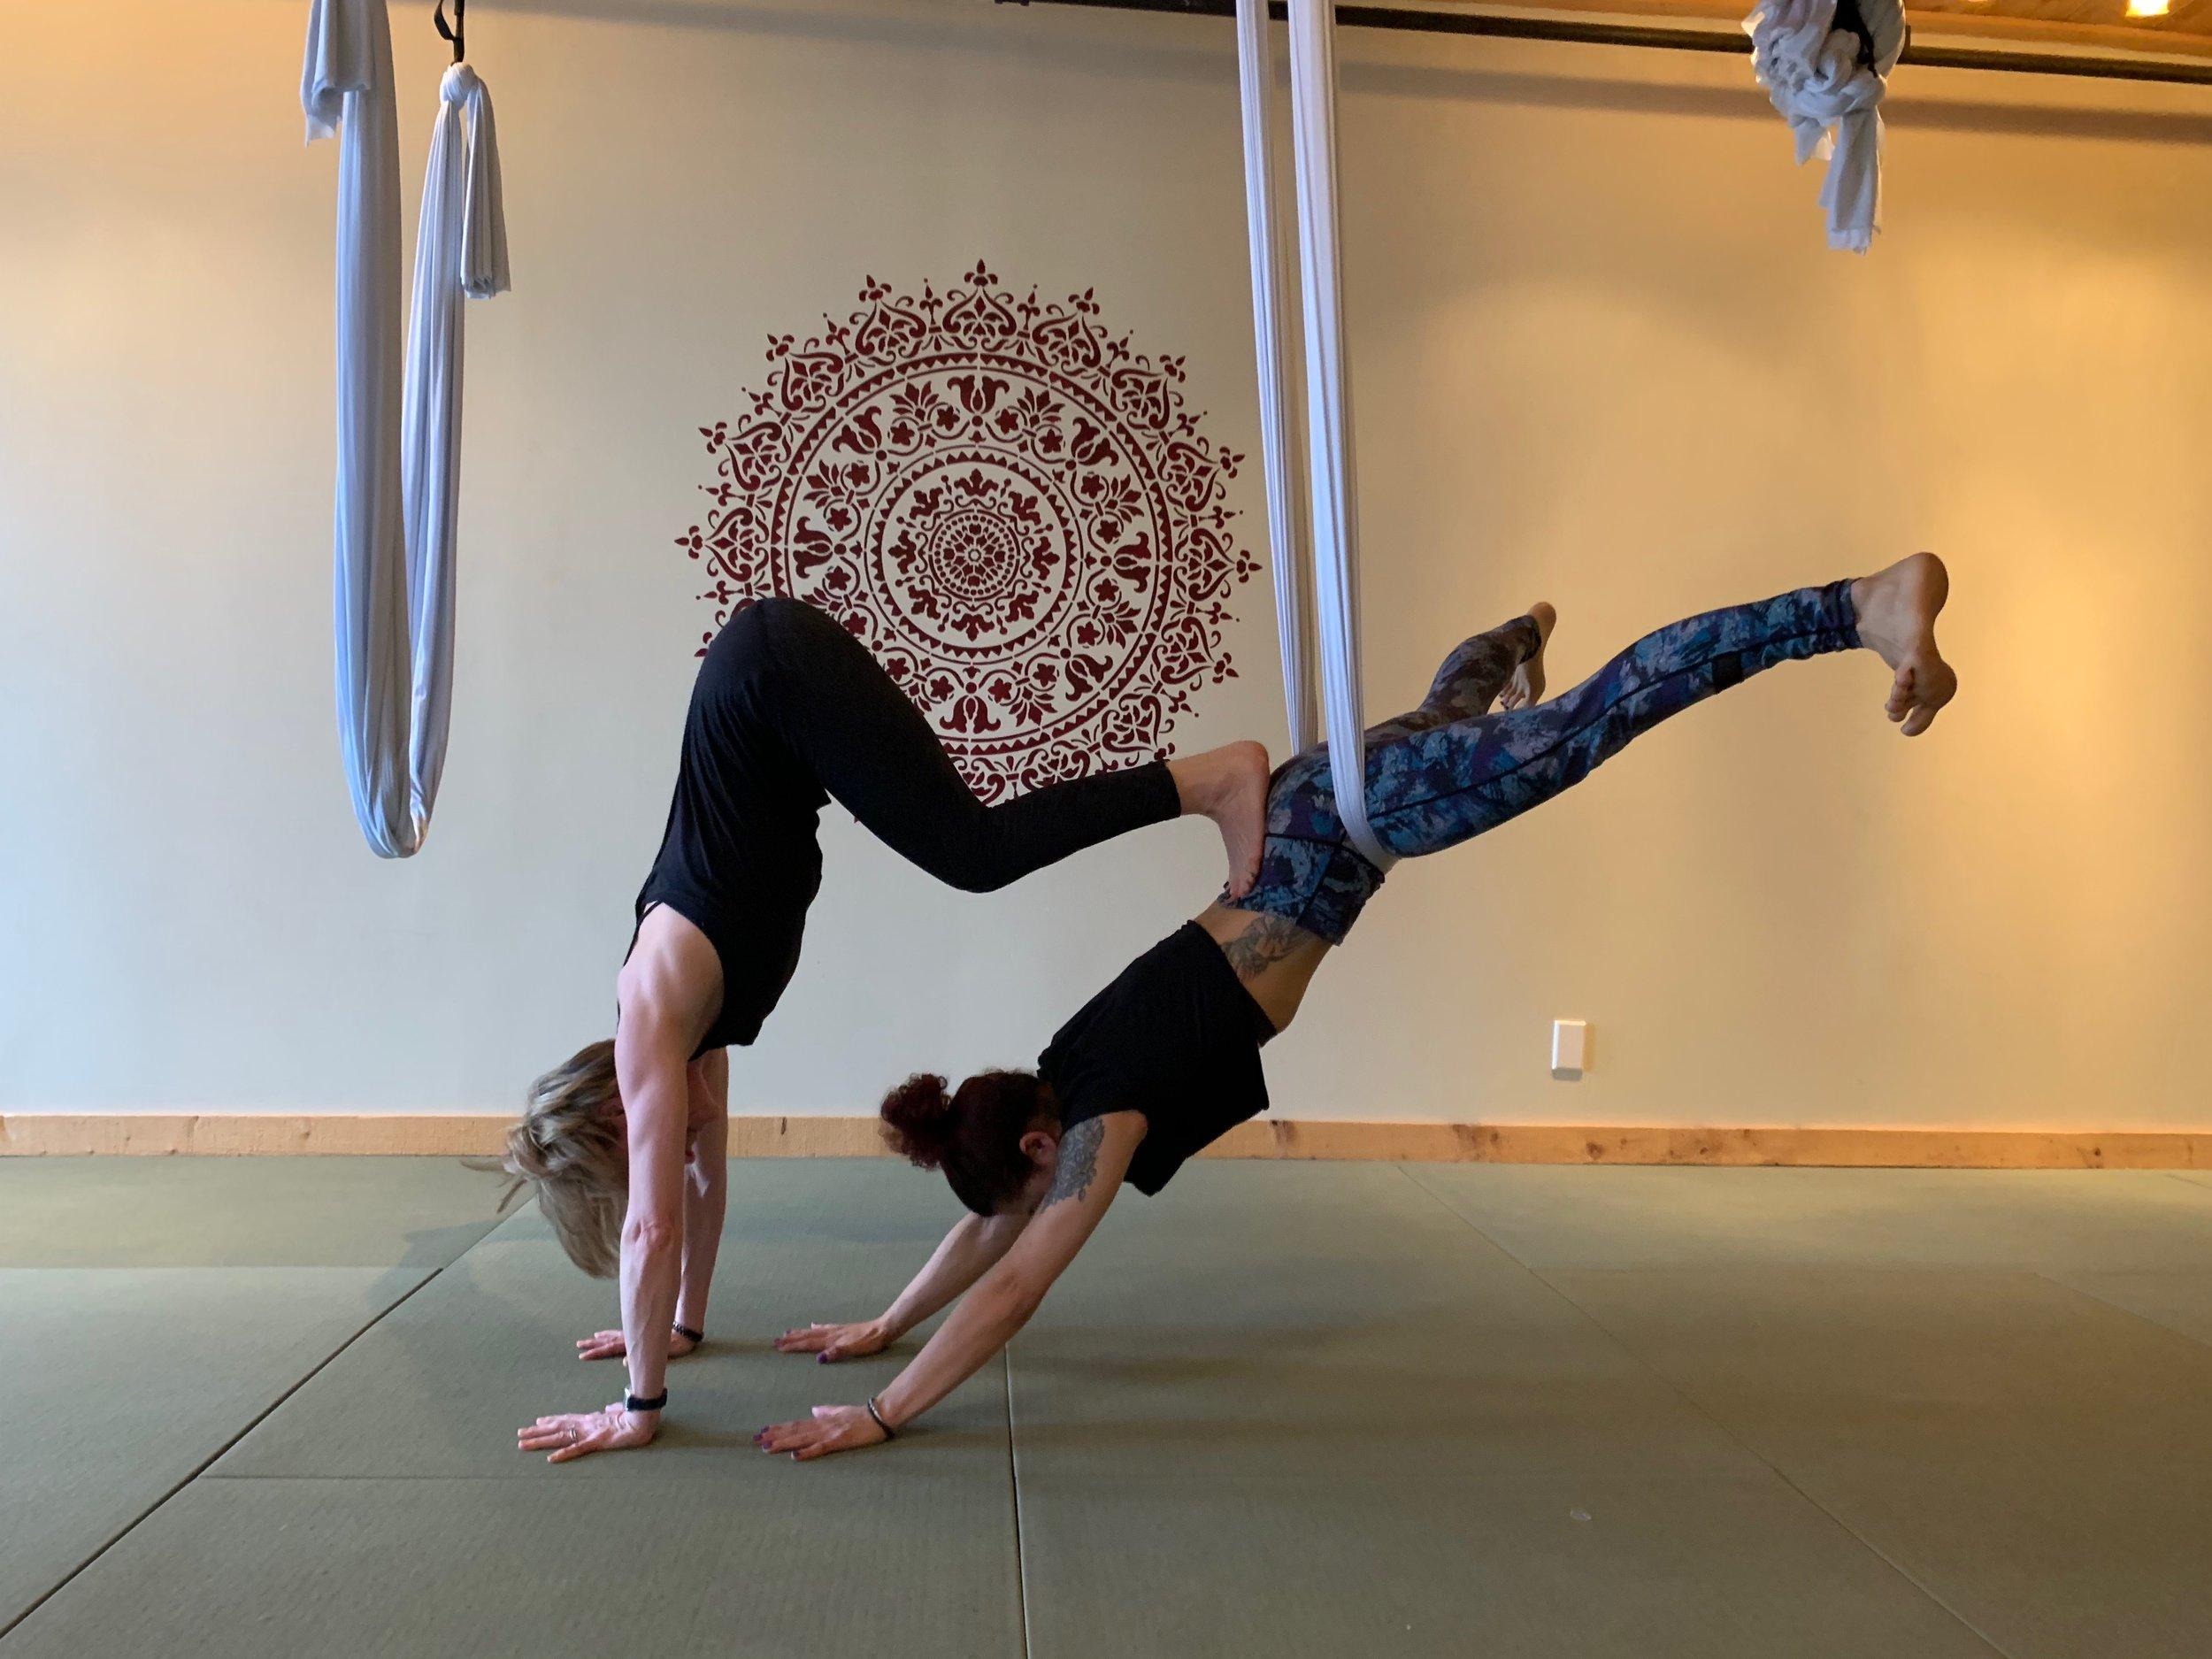 Perfect Pairing Chocolate Wine Aerial Partner Yoga Common Ground Yoga